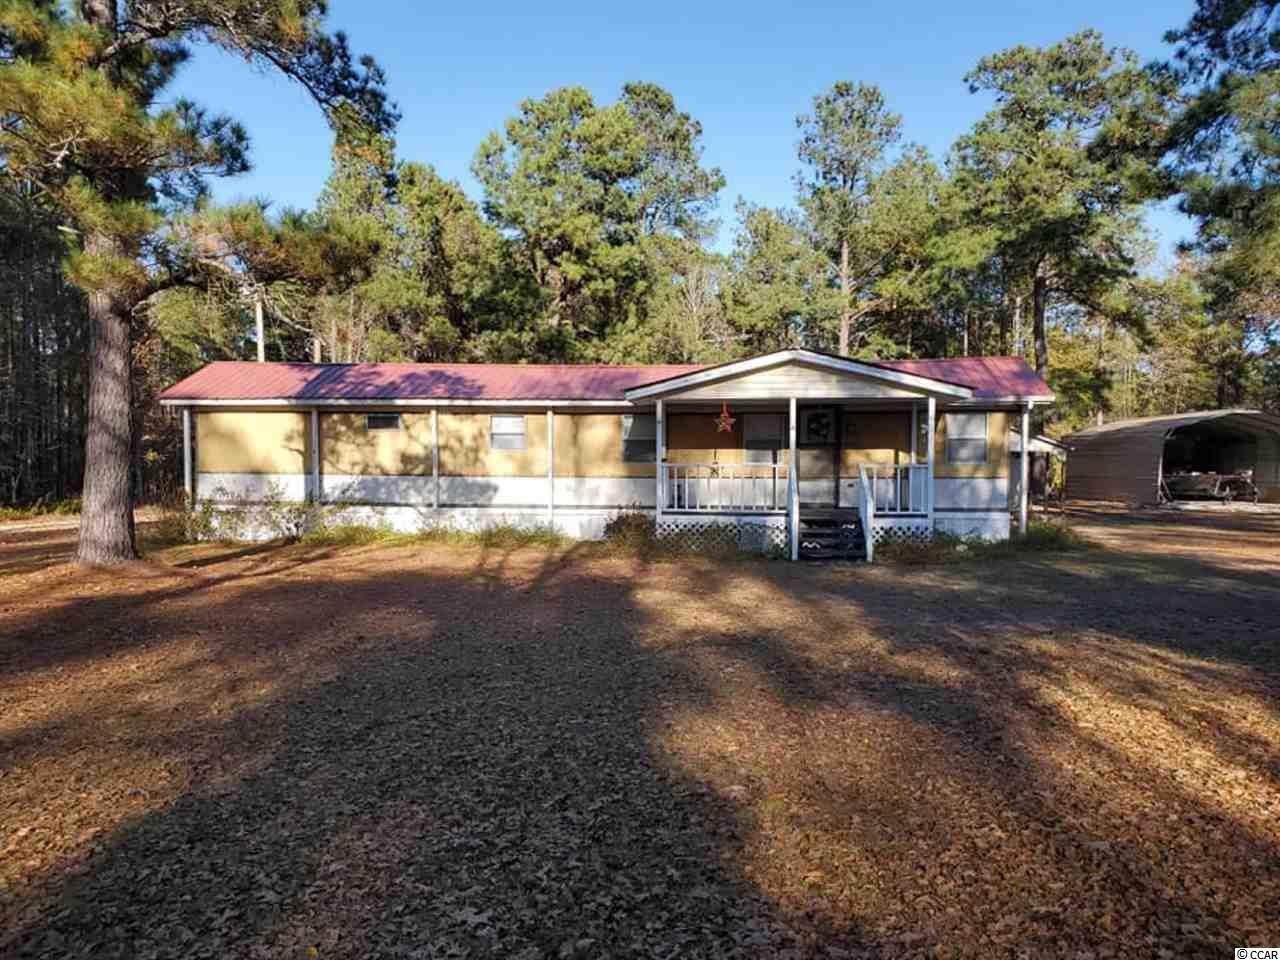 682 Pine Oaks Farm Rd. - Photo 1